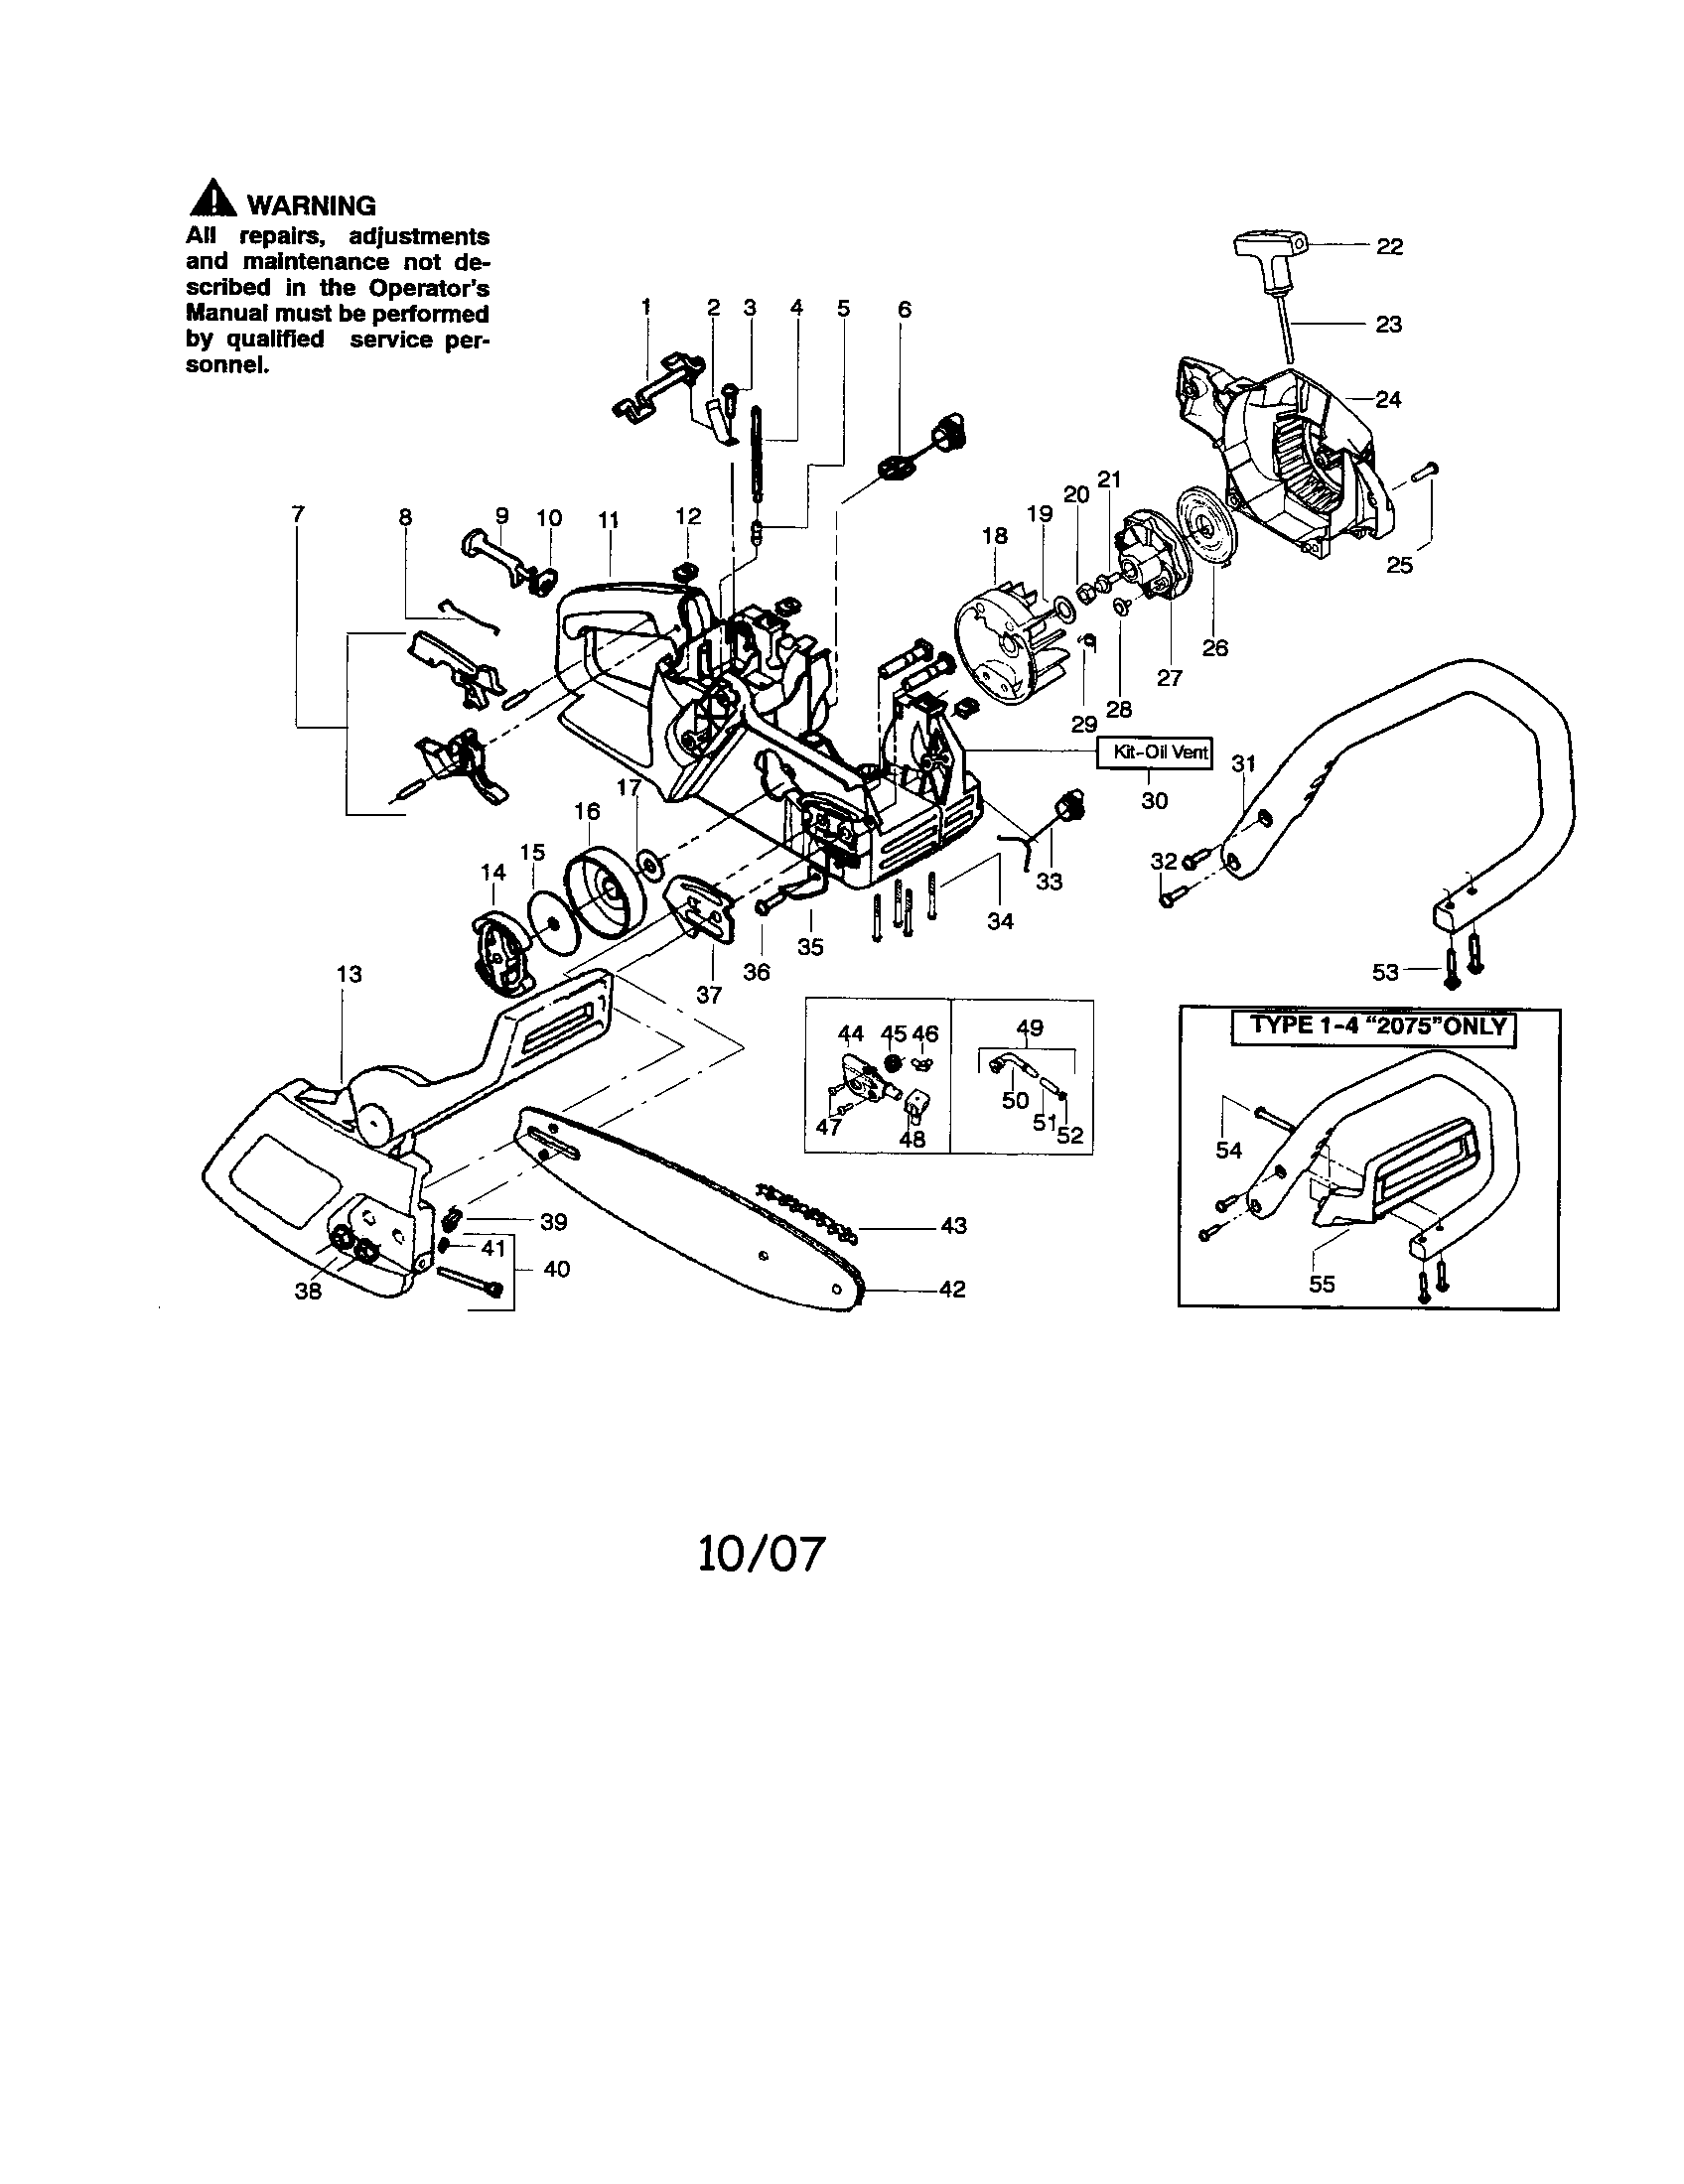 Poulan wiring schematics free download wiring diagrams schematics on poulan chainsaw fuel line diagram for poulan